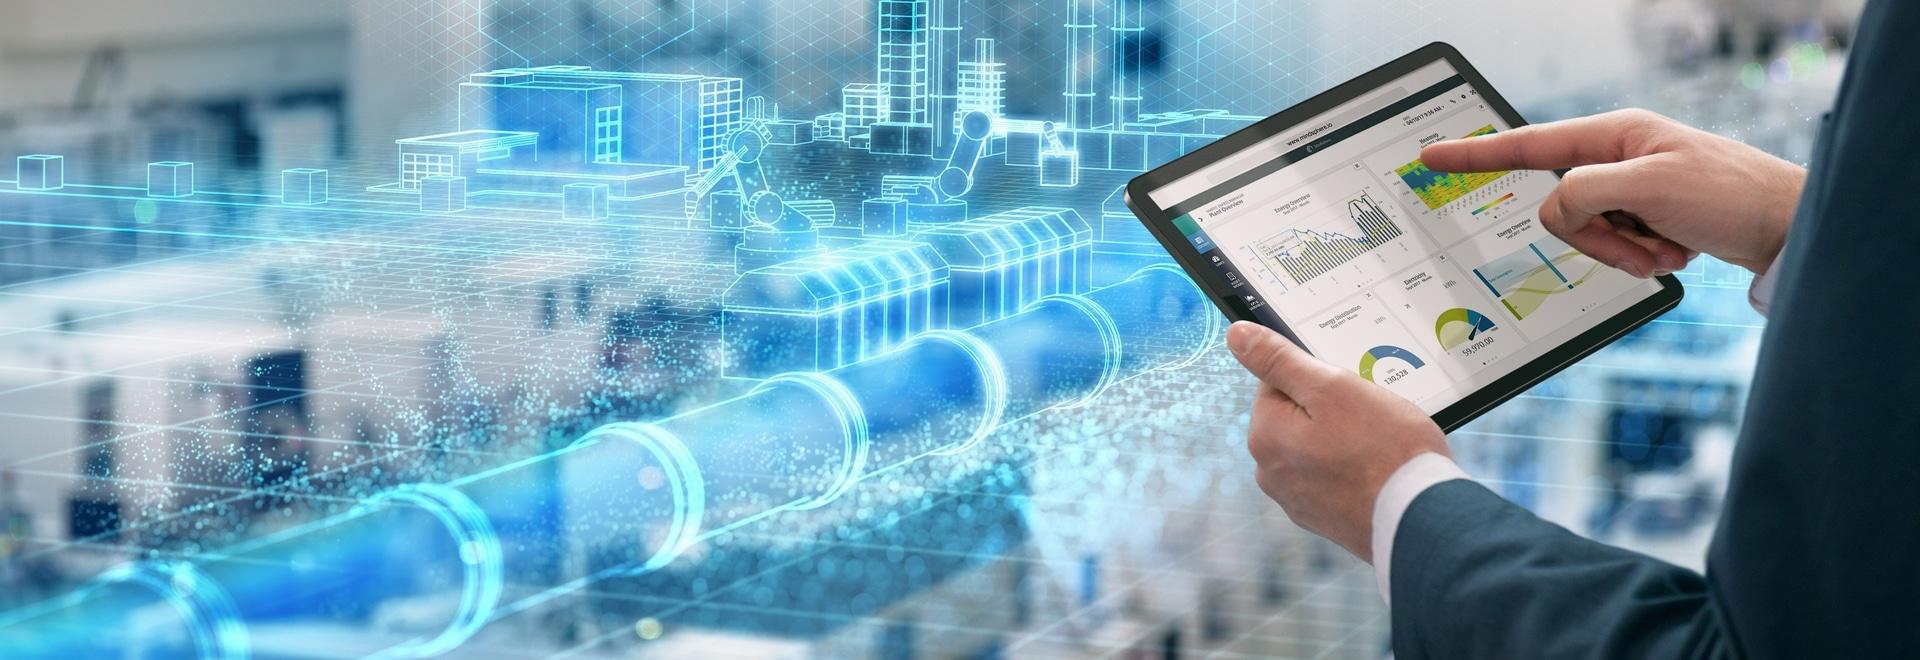 Industry 4.0 se presenta en Digital Industry USA 2019